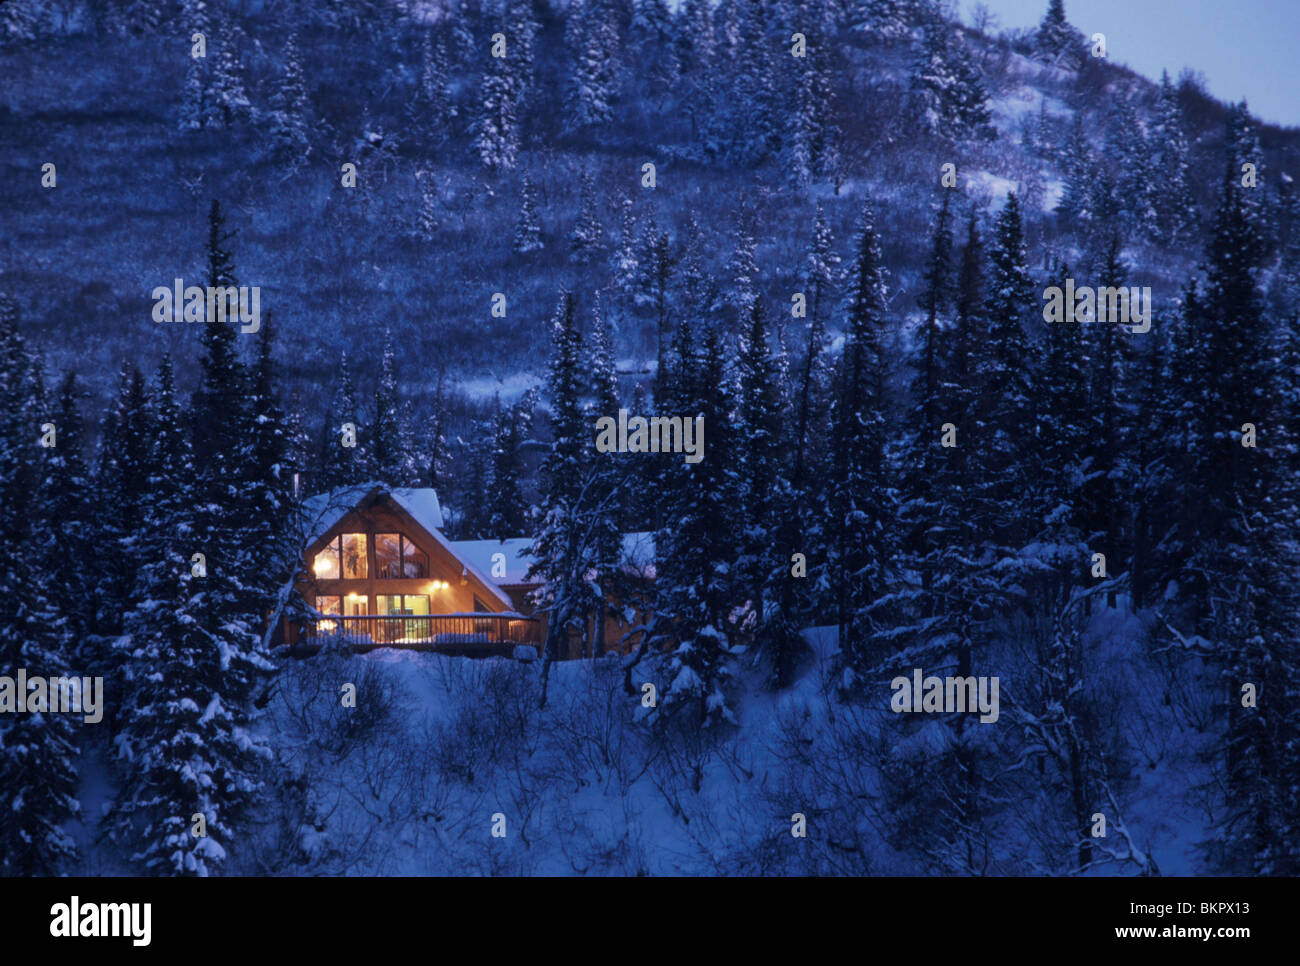 Live Snow Falling Wallpaper For Desktop Home Cabin In Snow Covered Forest Lights On Dusk Sc Ak